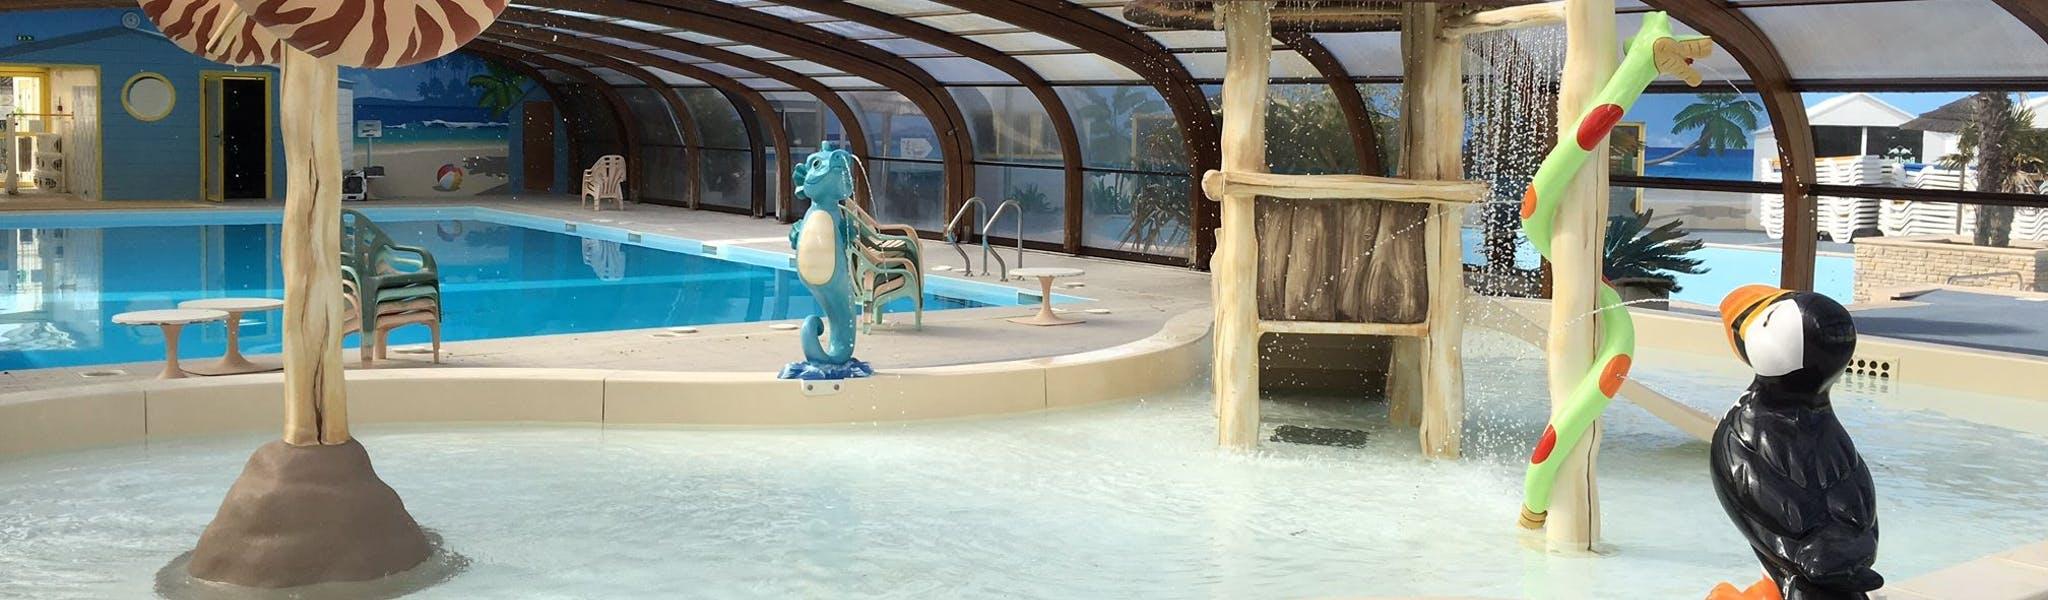 binnenzwembad Loisirs